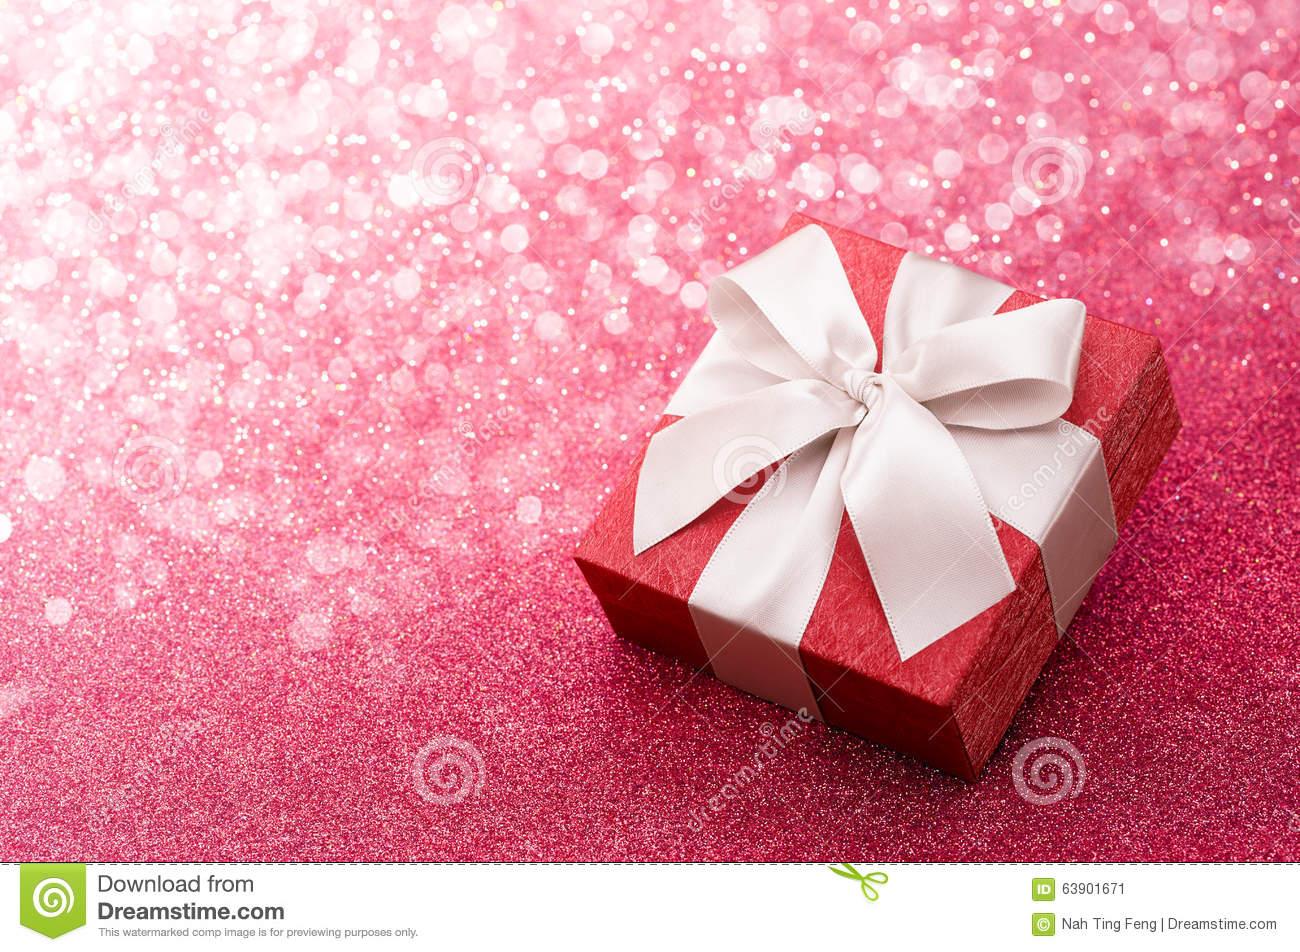 Gift Box On Pink Glitter Background Stock Photo   Image  63901671